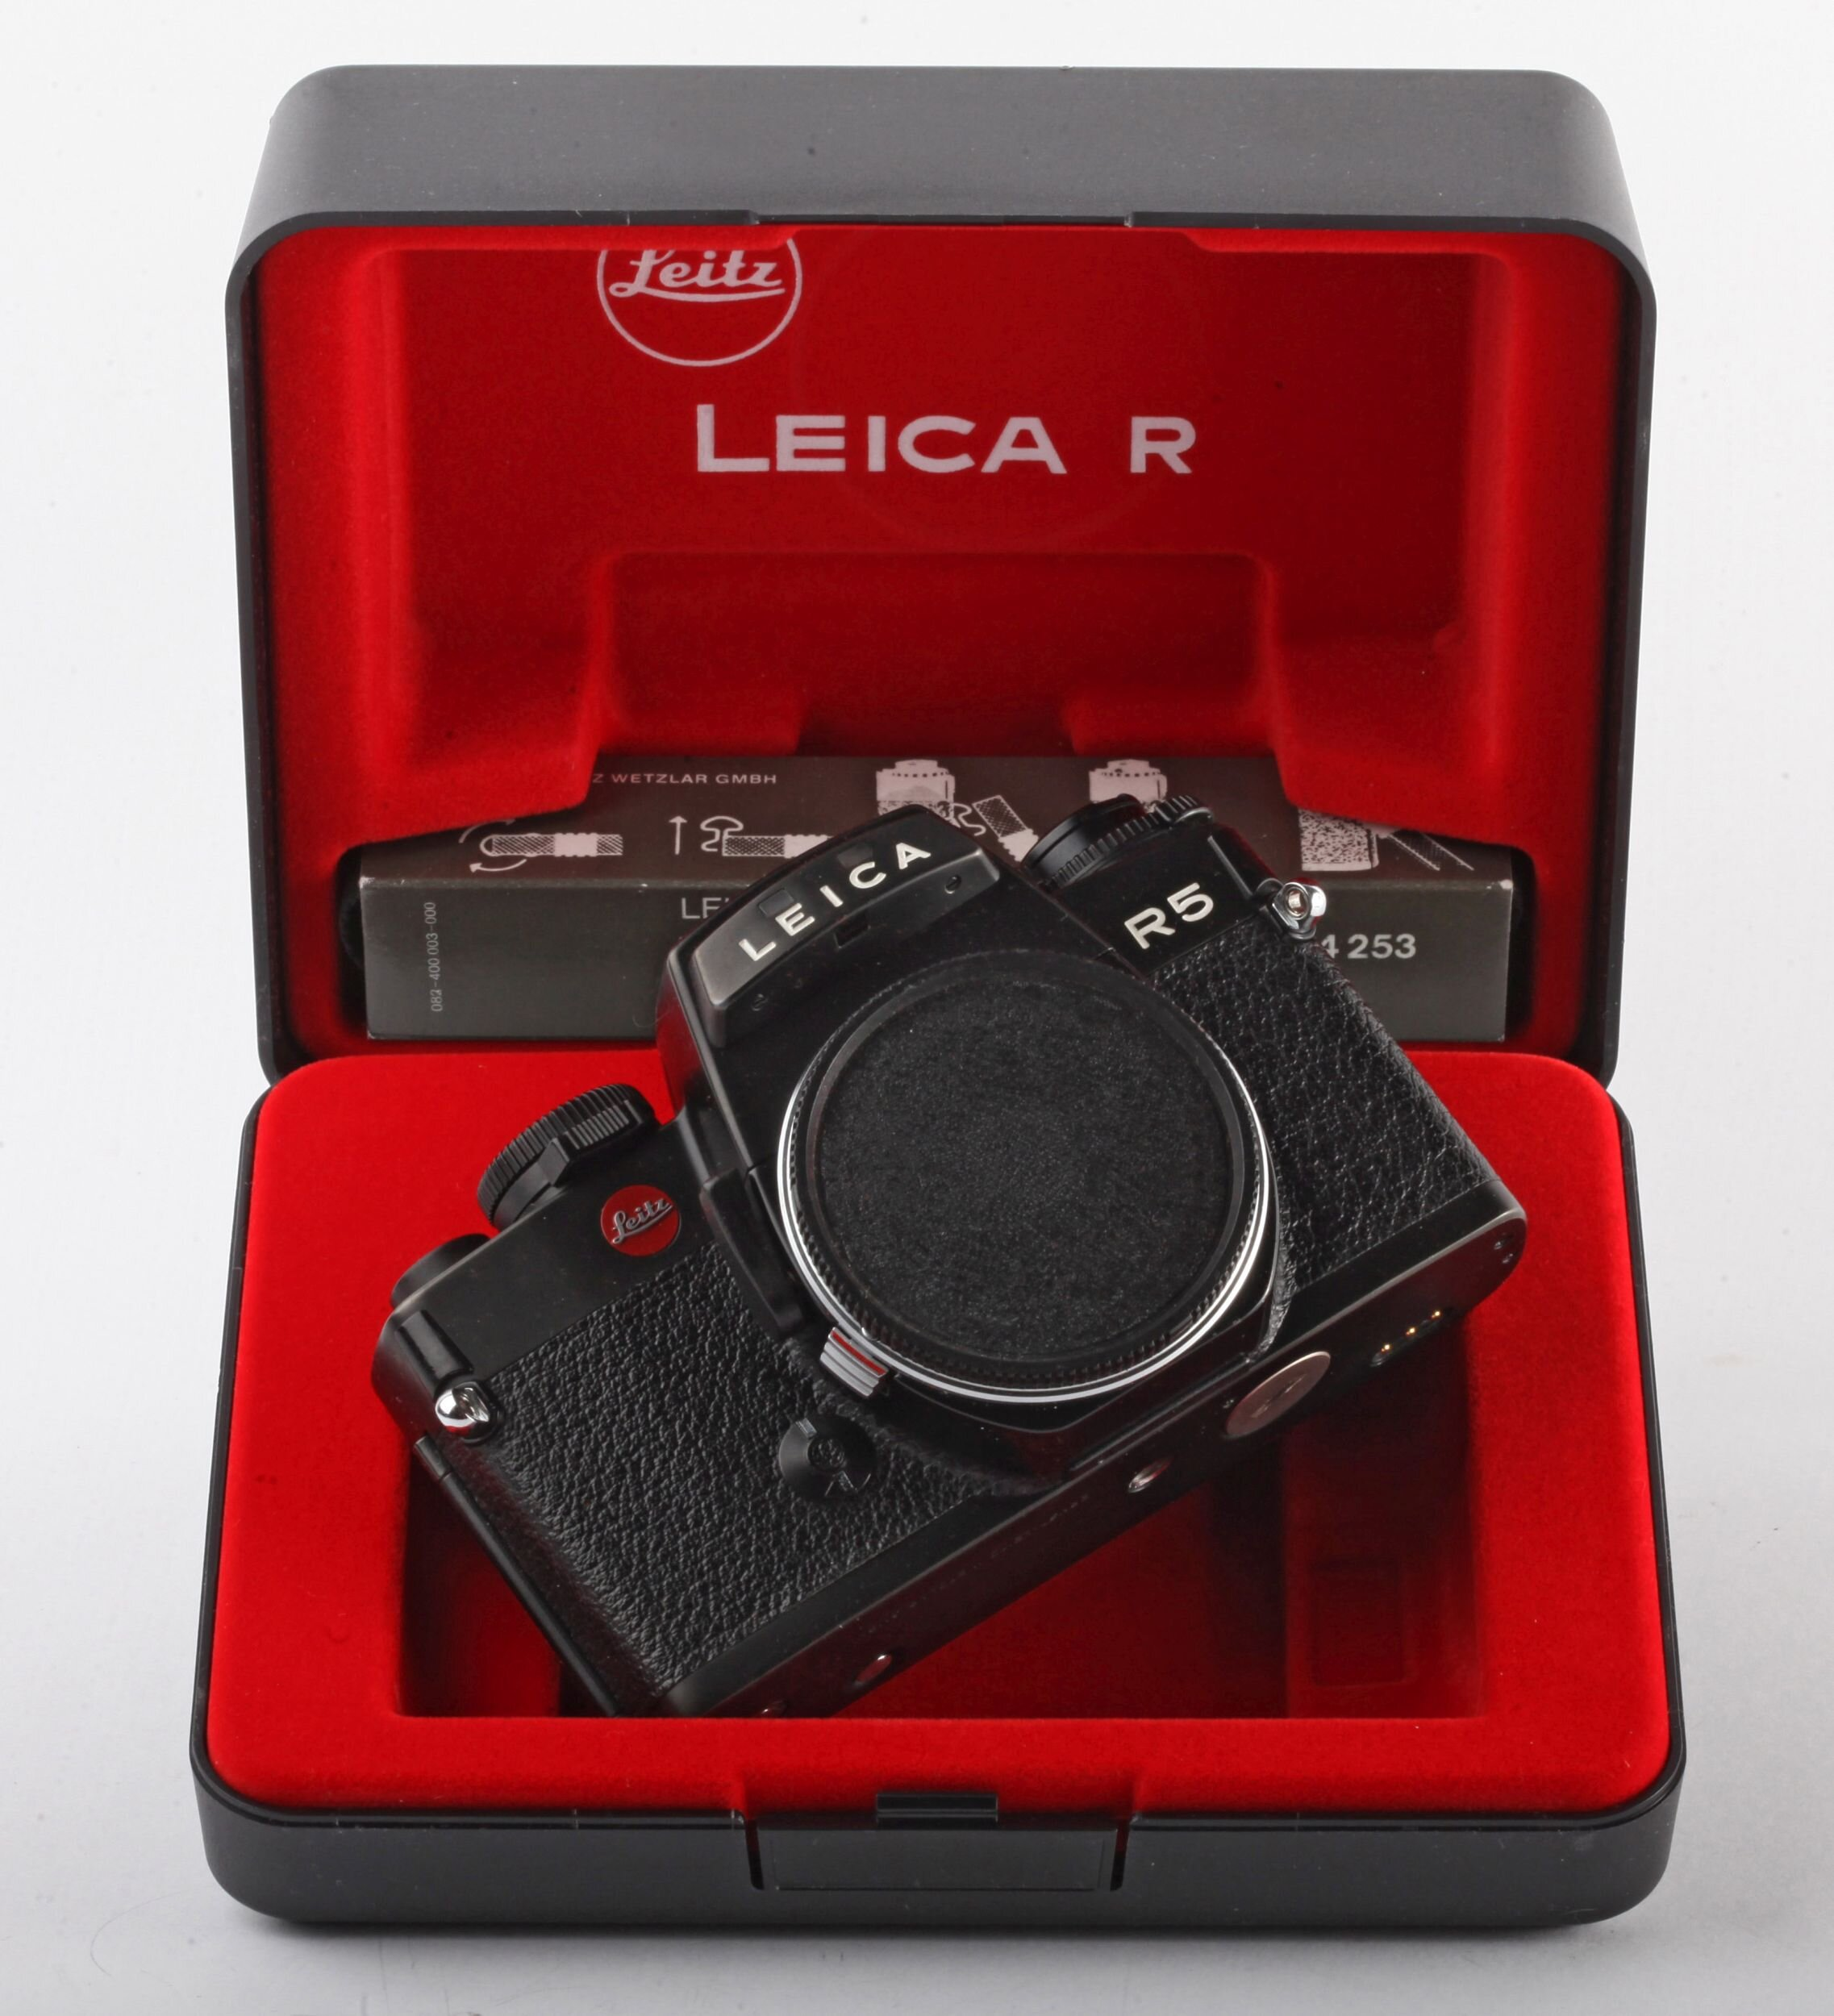 Leicaflex R5